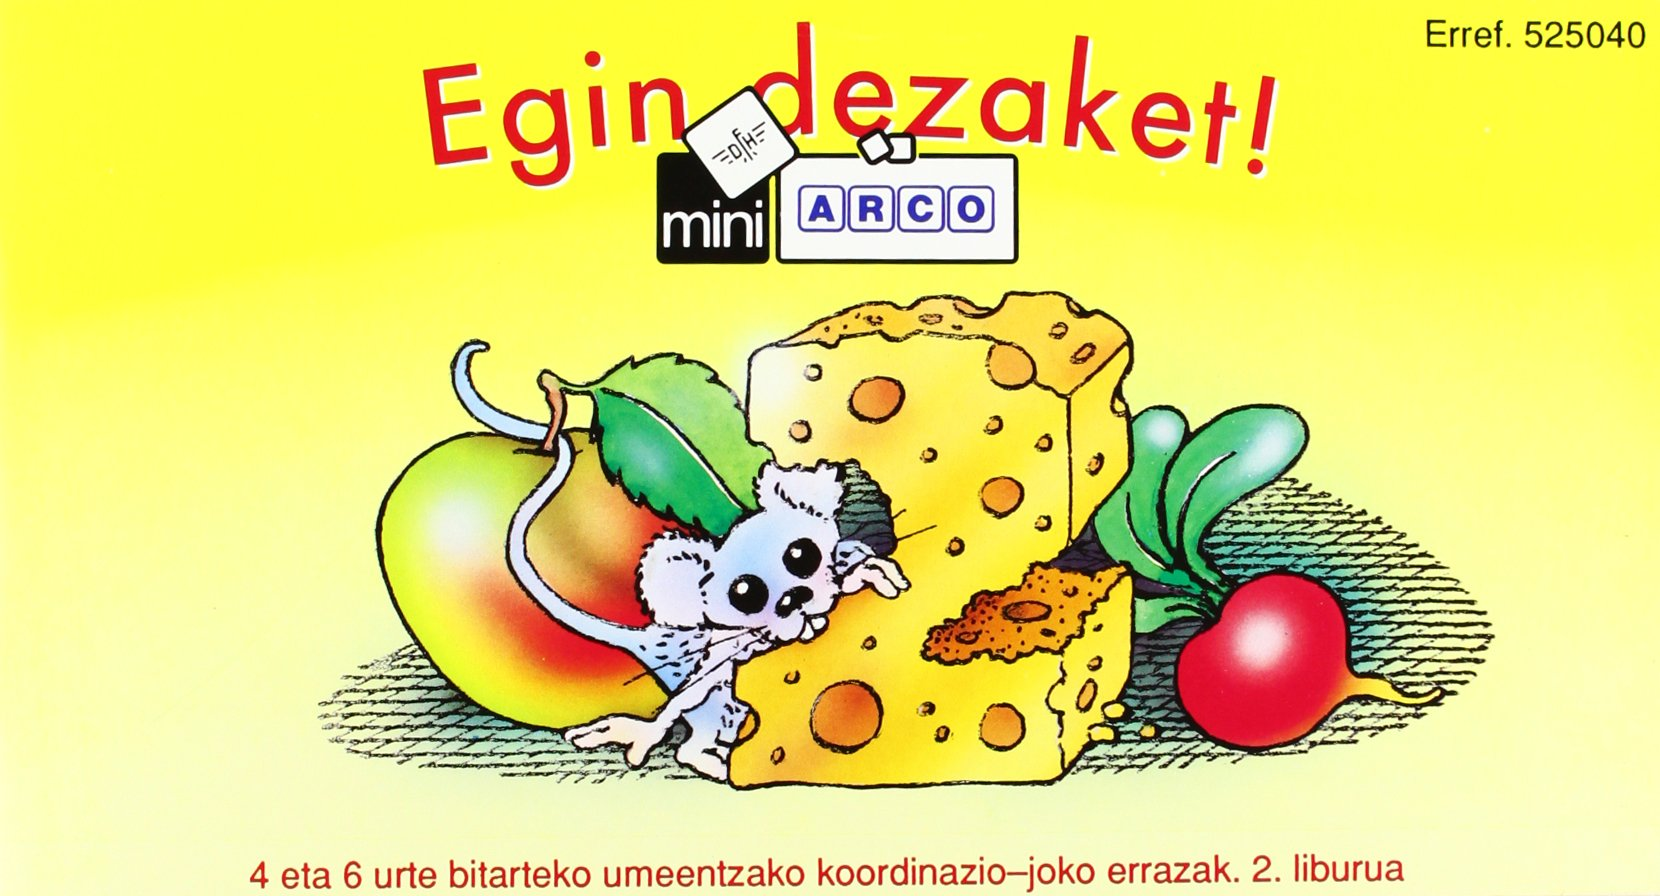 Egin dezaket 2 (Mini arco): Amazon.es: Vogel, H., Vogel, H., Elhuyar: Libros